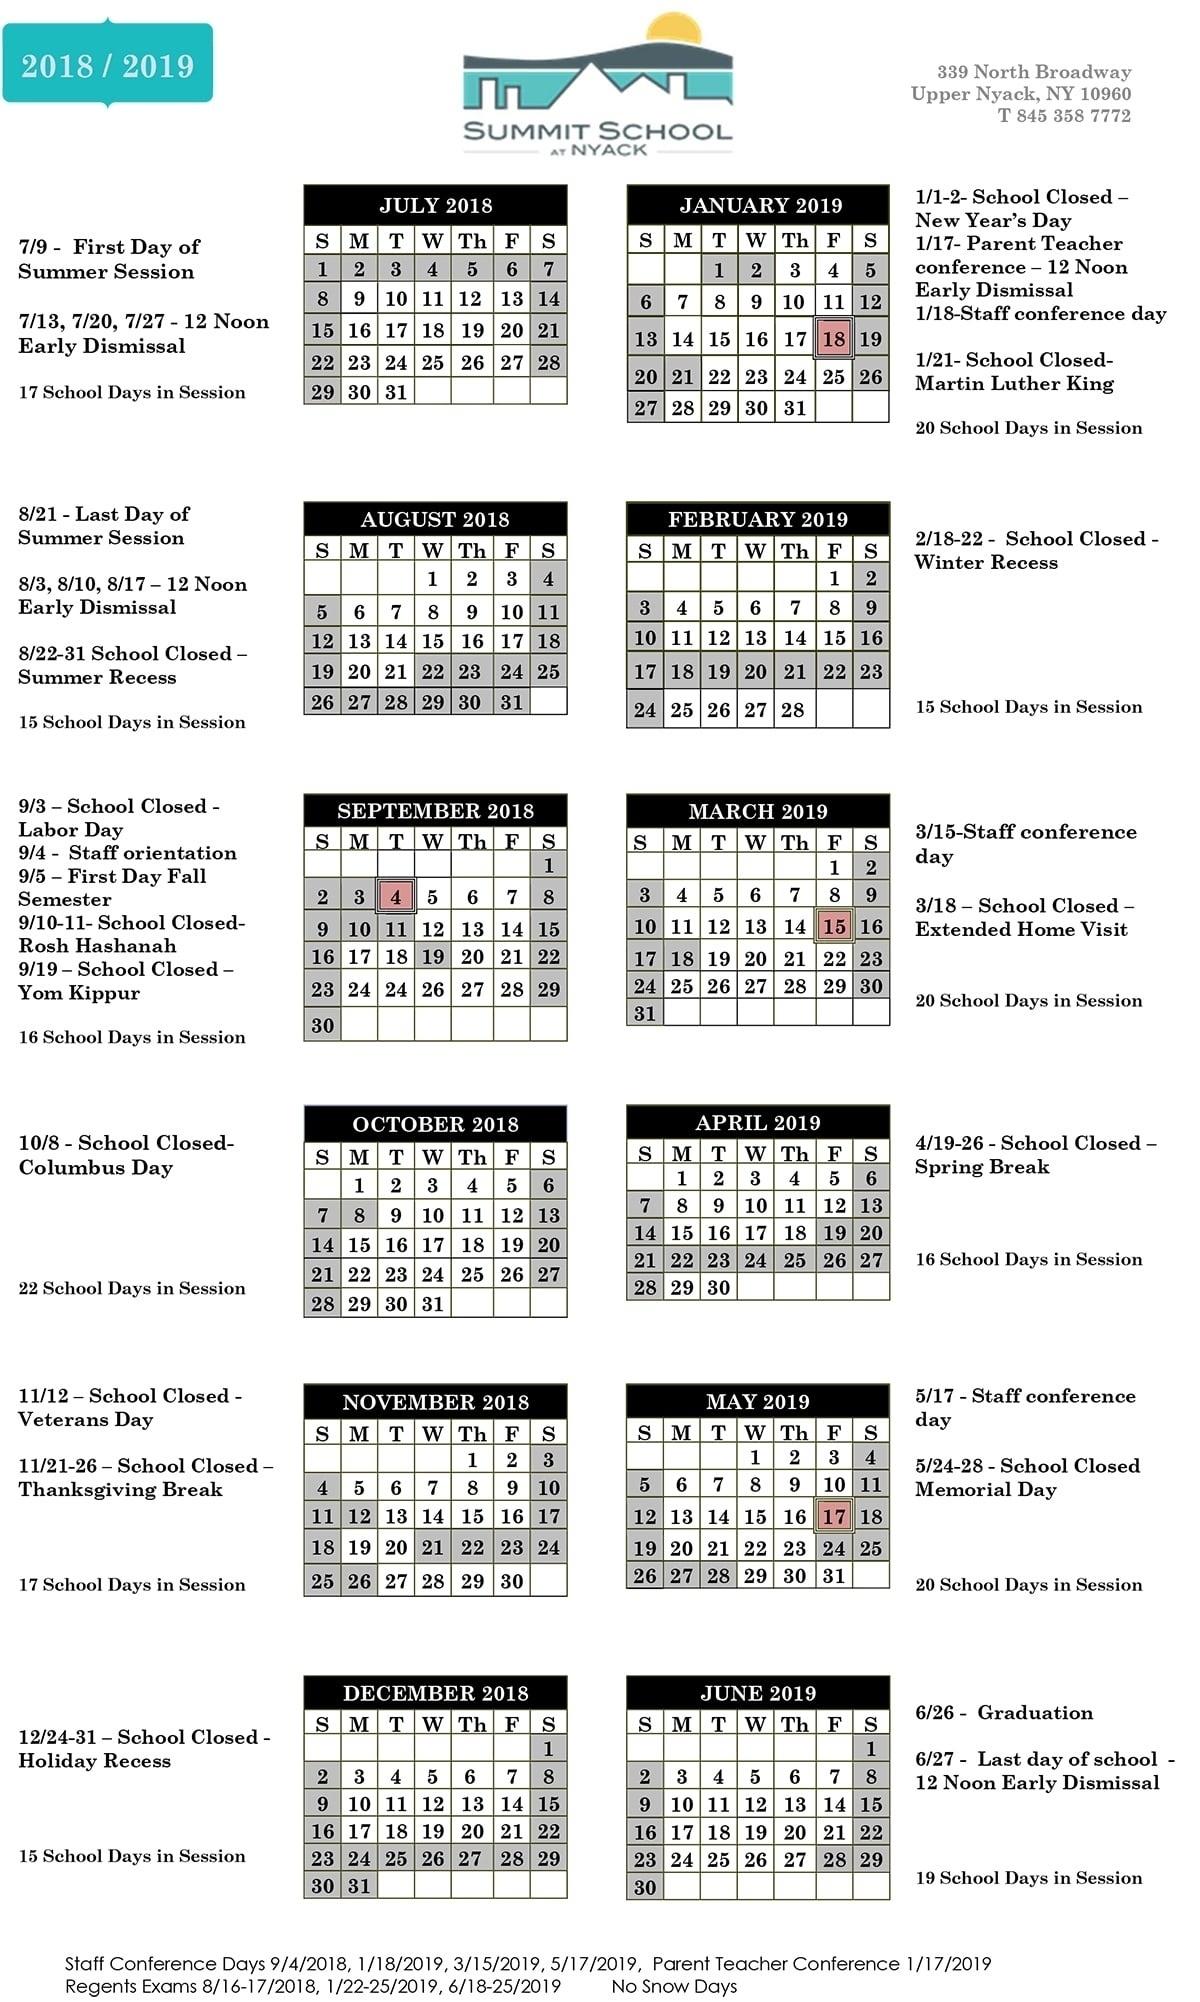 Perky Boces 2 School Calendar • Printable Blank Calendar Template_Boces 2 School Calendar